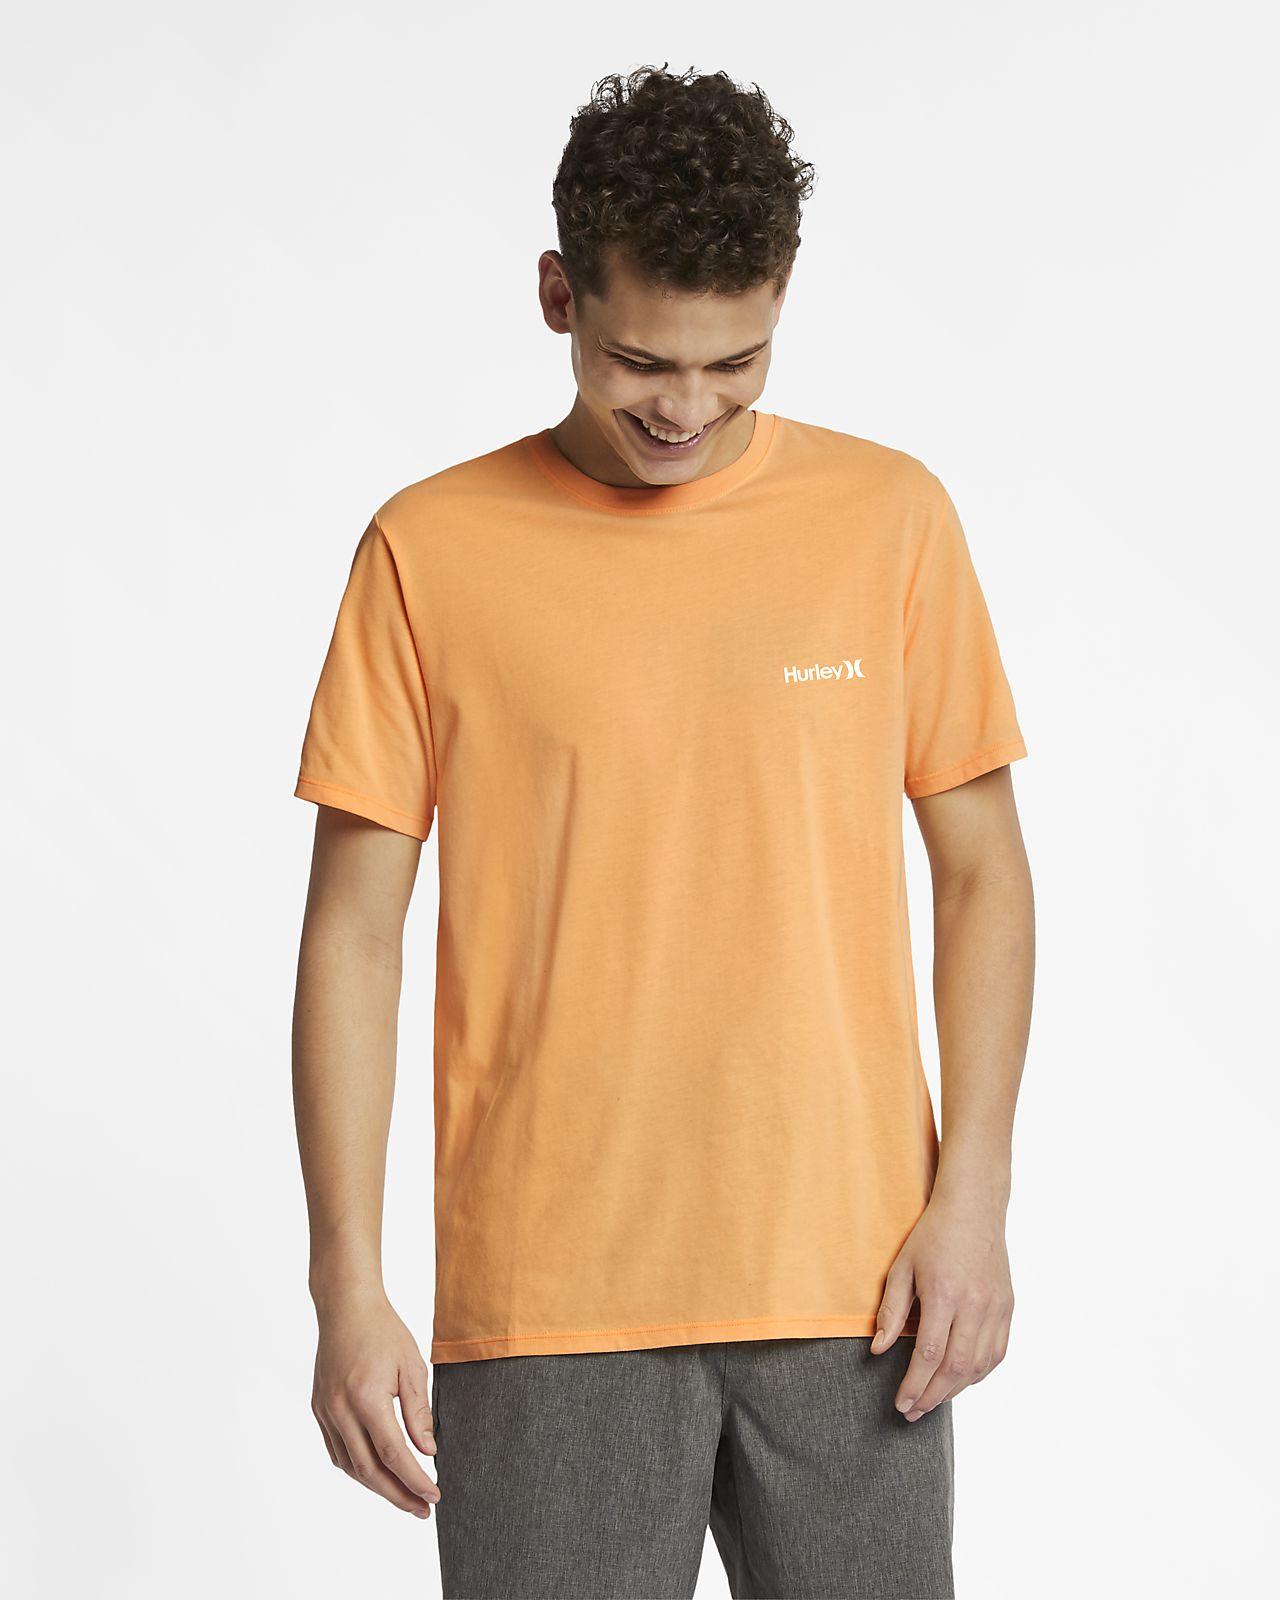 T-shirt Hurley Dri-FIT One And Only för män